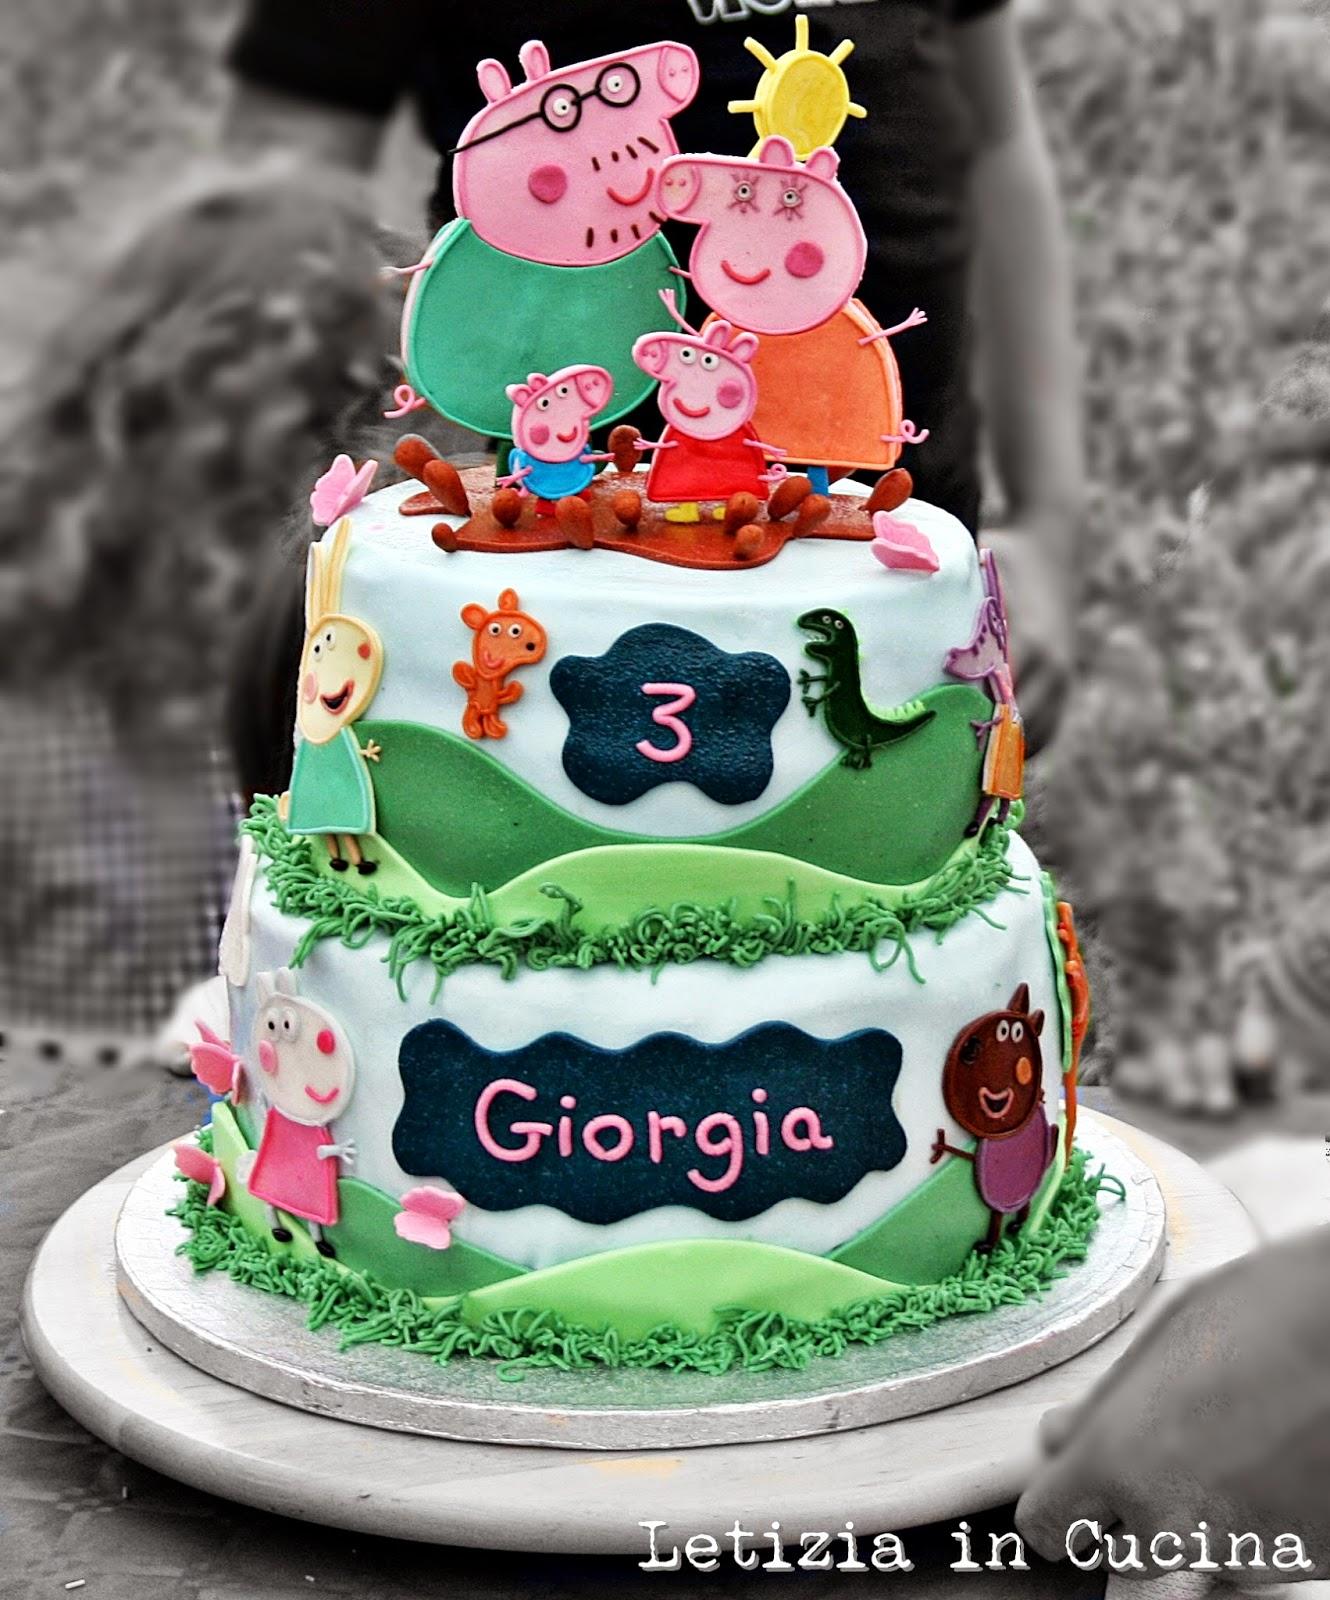 Letizia in Cucina: Torta Peppa Pig - 3° Compleanno Giorgia